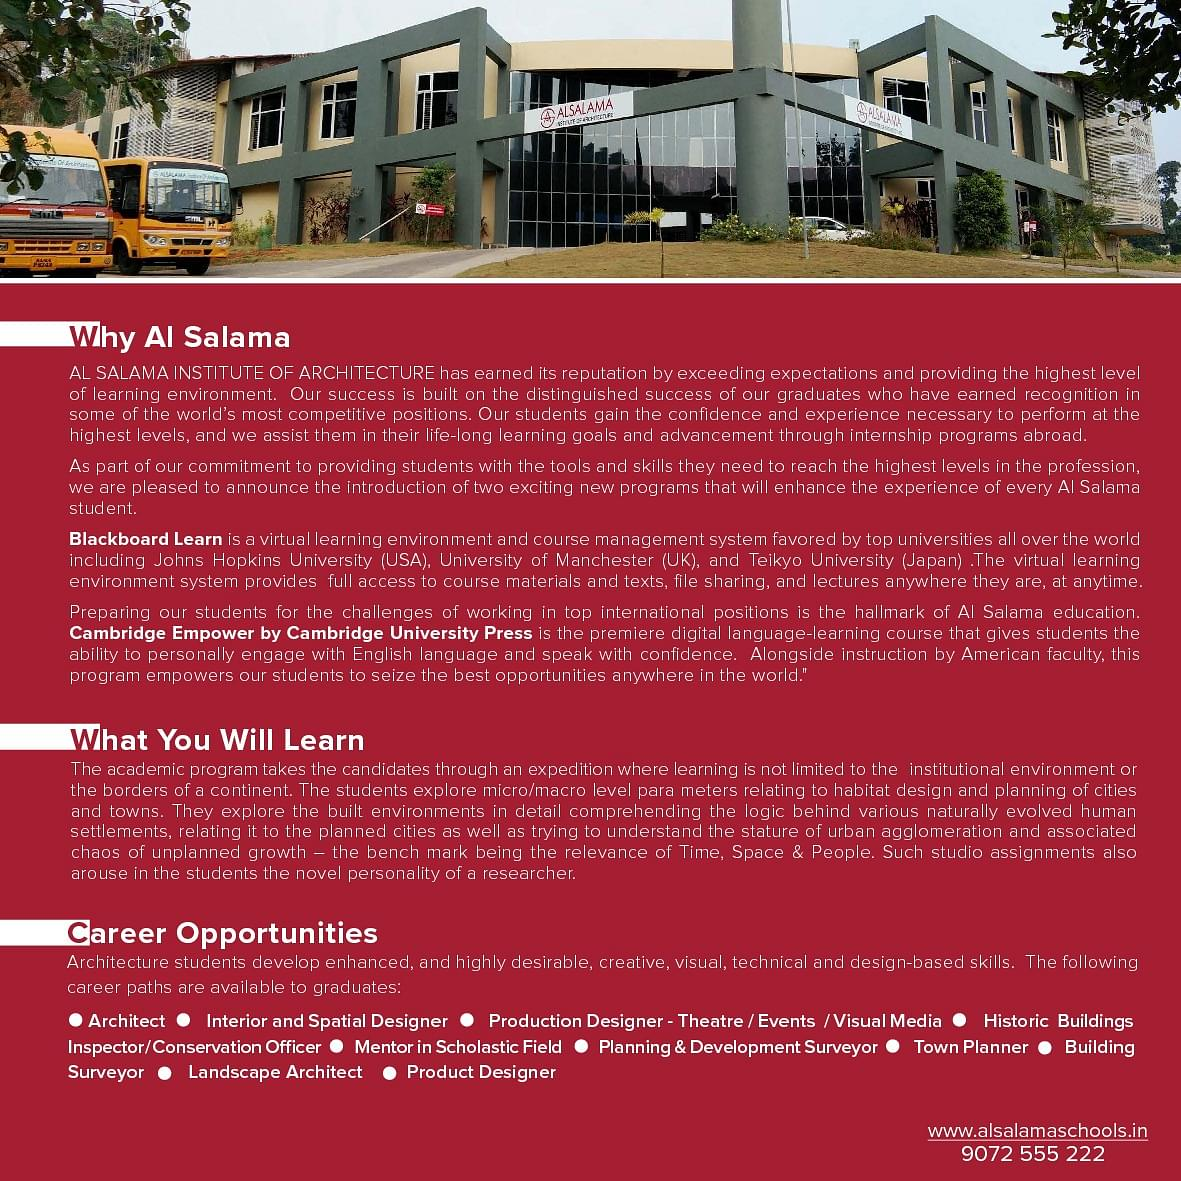 Wondrous Al Salama Institute Of Architecture Asia Perinthalmanna Download Free Architecture Designs Scobabritishbridgeorg